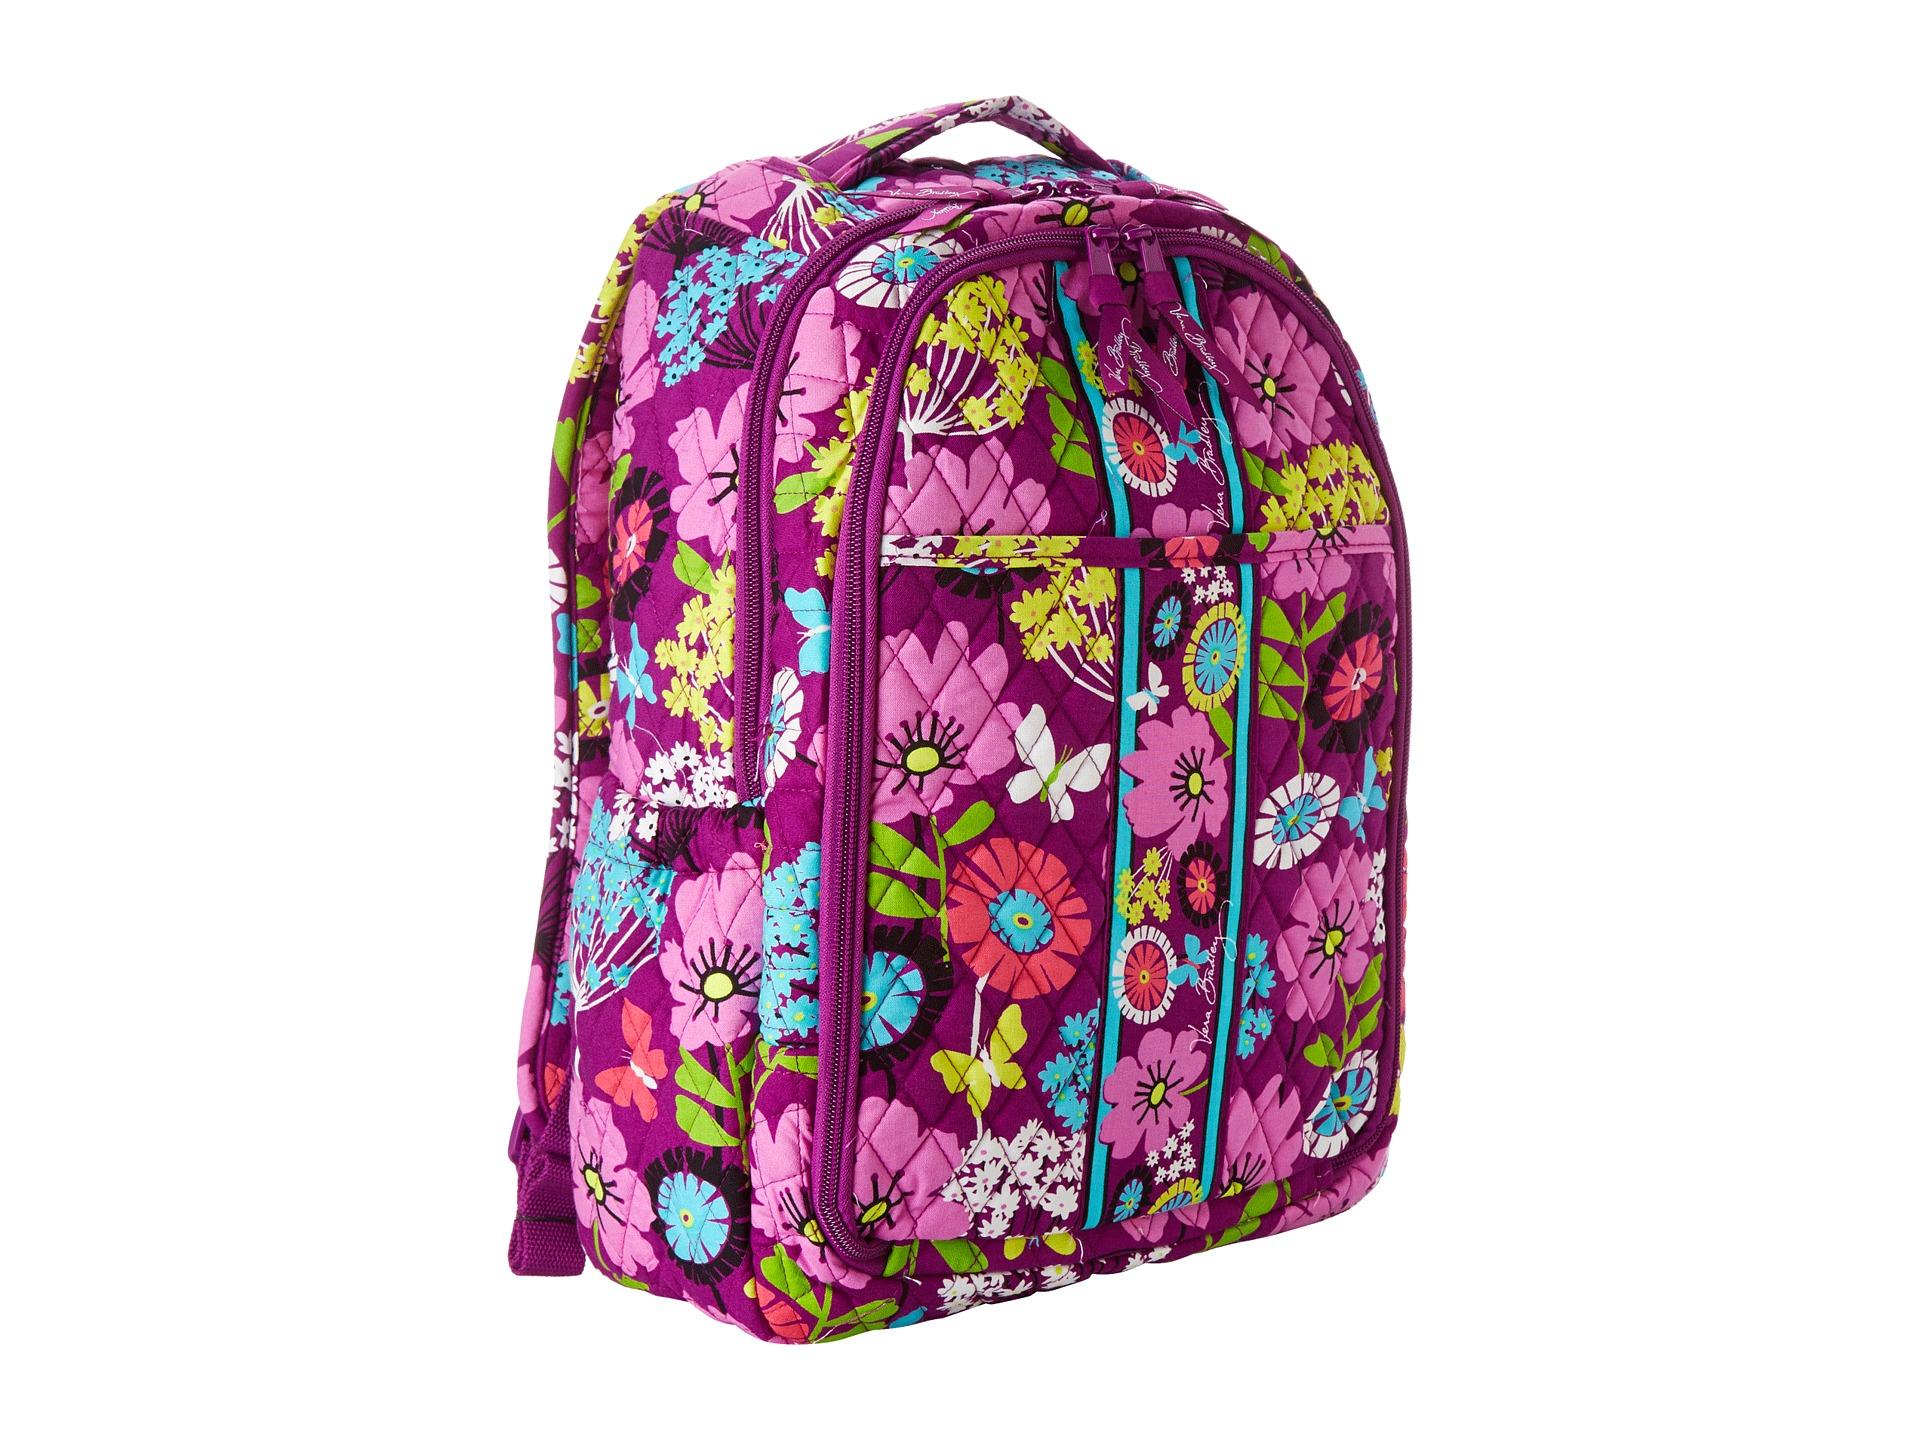 Vera Bradley Backpack Baby Bag Review